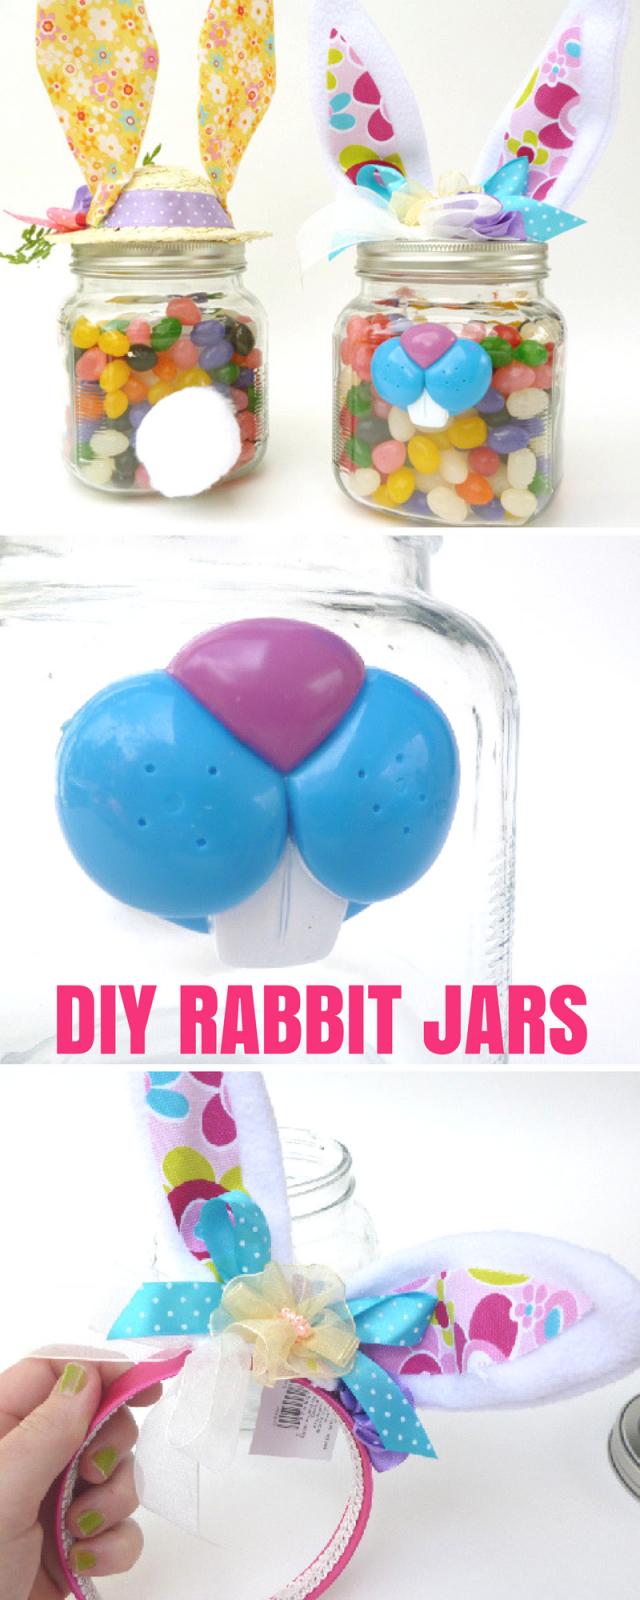 Somebunny Rabbit Gift Jars - Easter Craft Tutorial